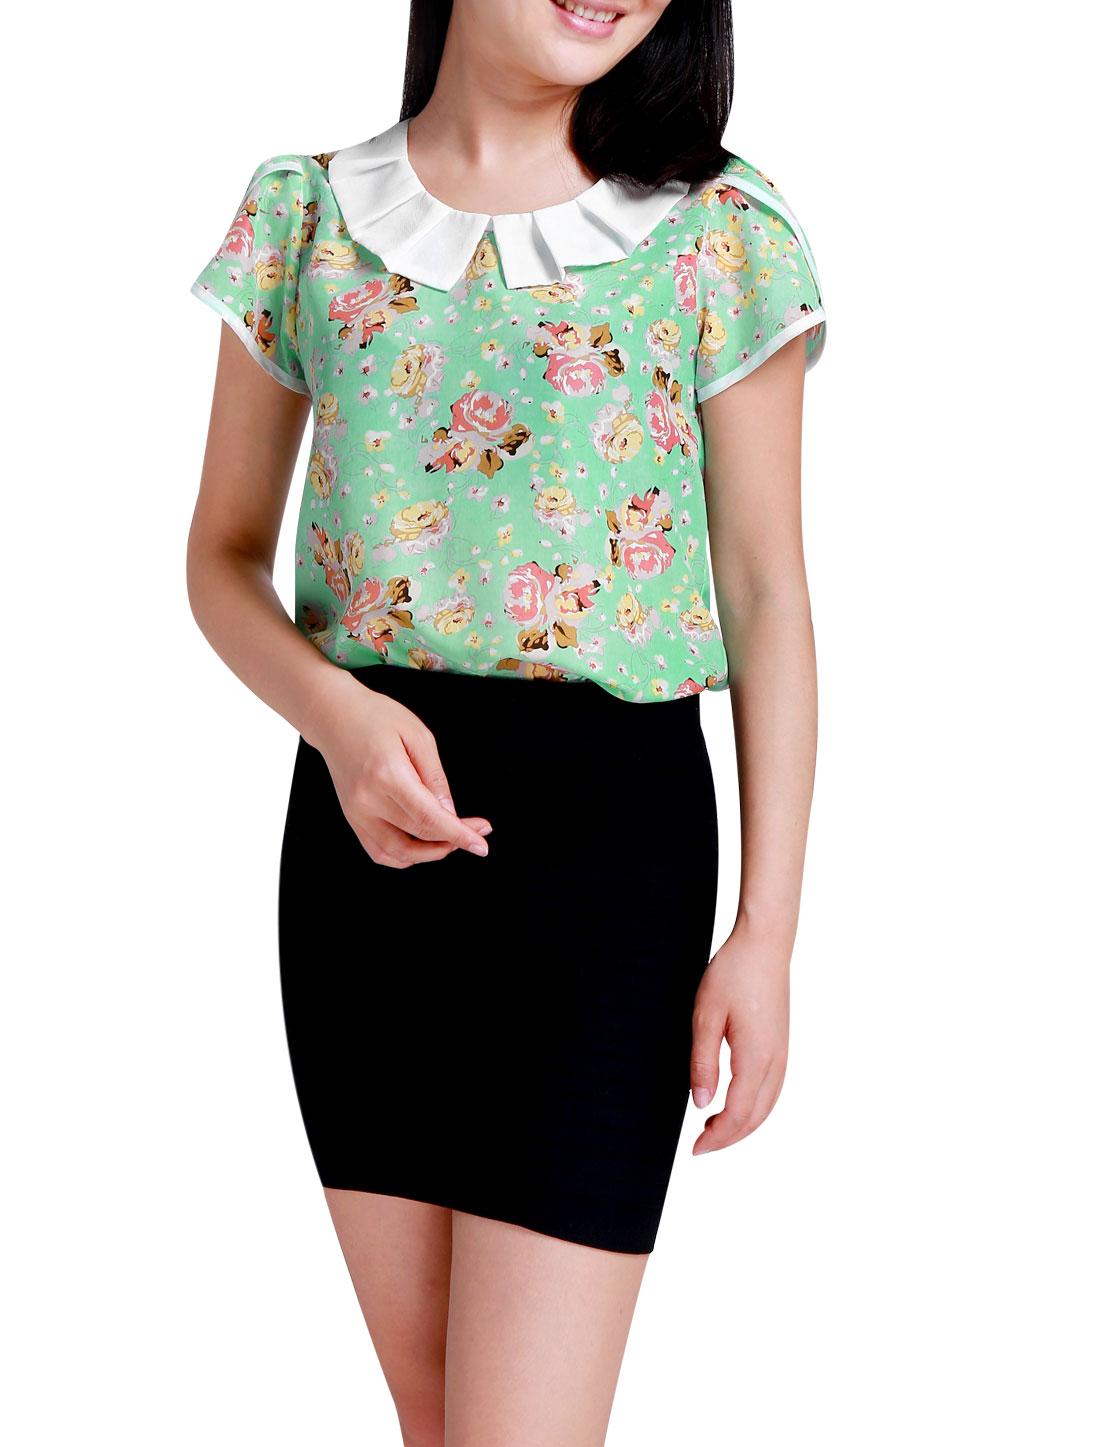 Women Peter Pan Collar Floral Pattern Chiffon Shirts Mint Pink XL